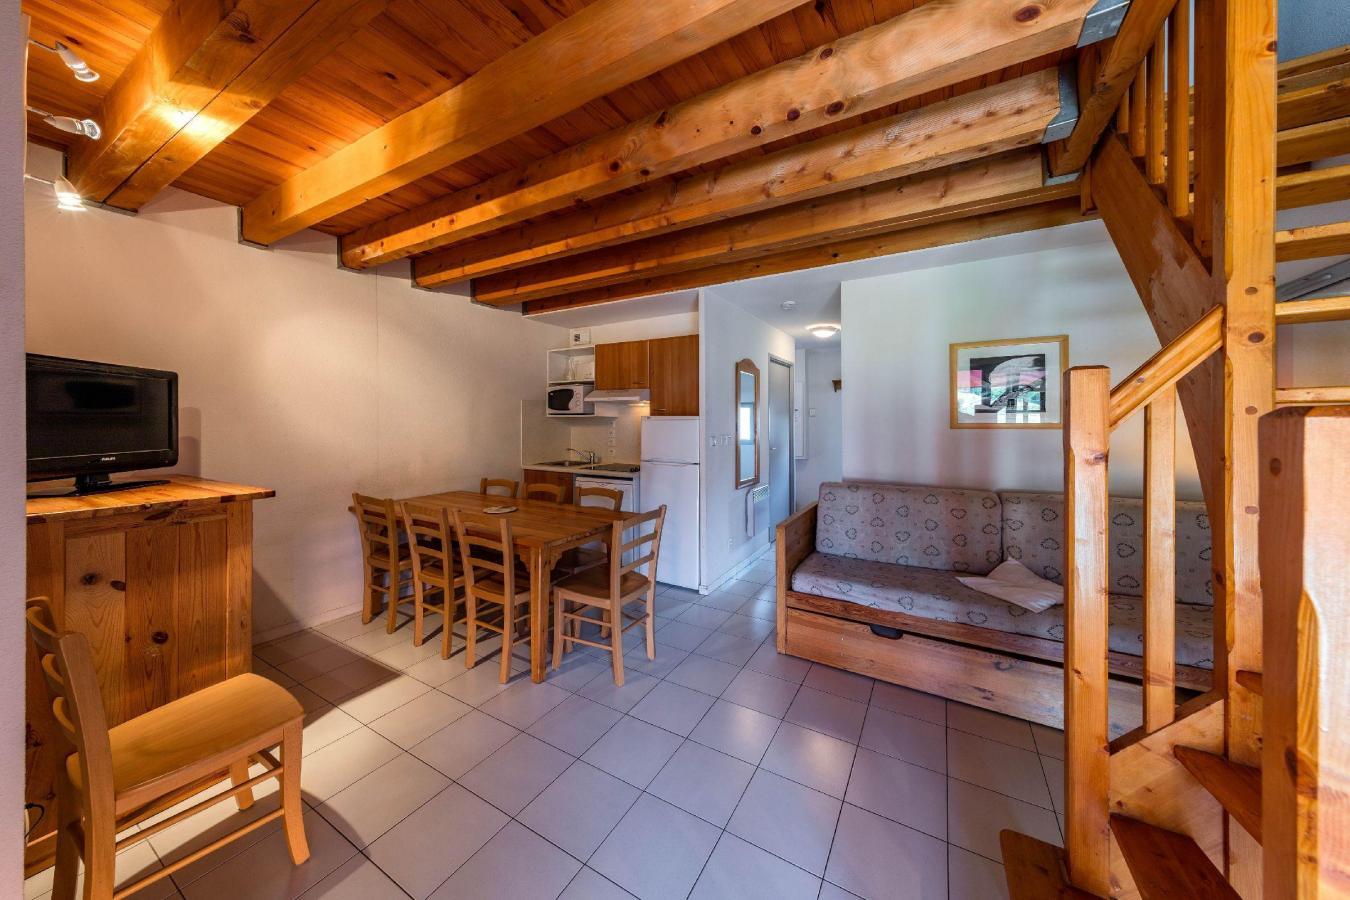 Location au ski Residence Les Trois Vallees - Saint Lary Soulan - Appartement